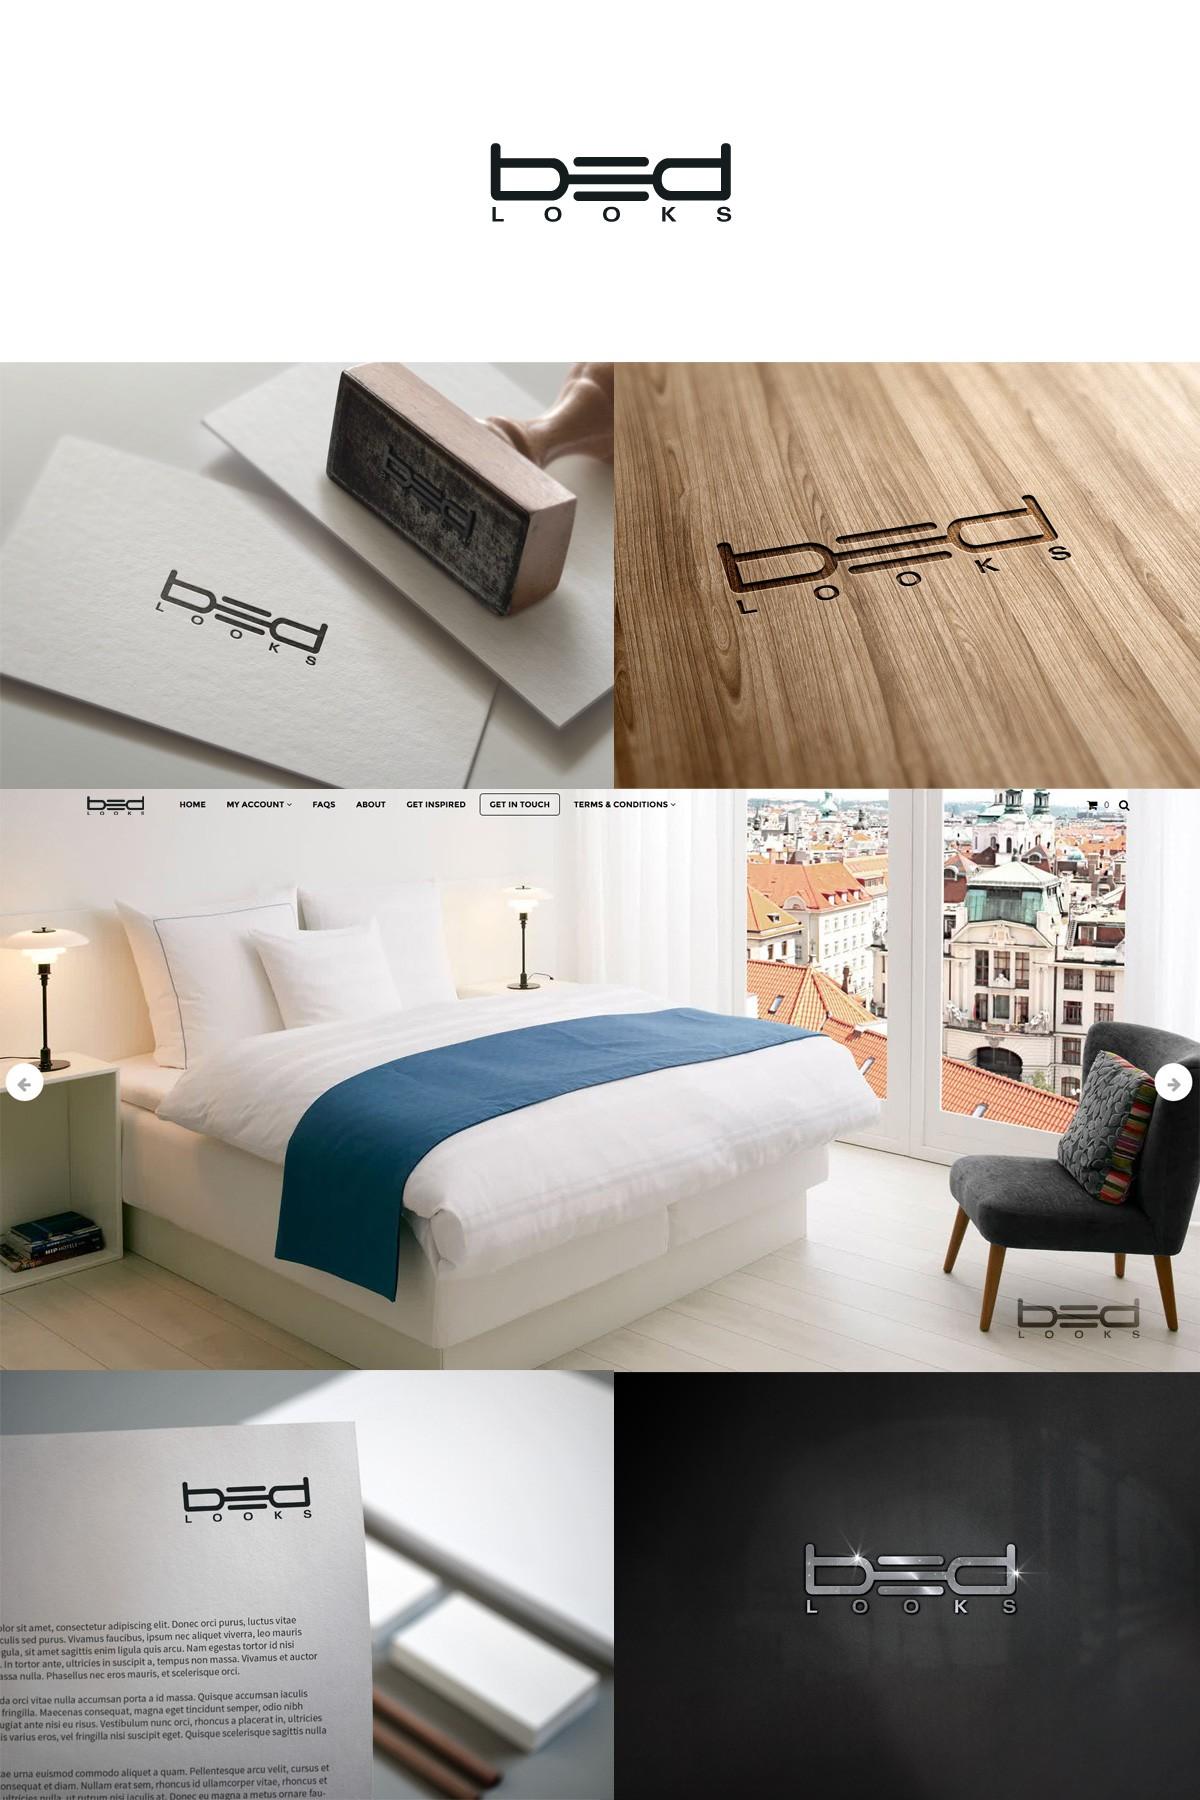 Create a simple, minimalistic logo for bedlooks.com. Hidden or subtle messages/symbolic appreciated